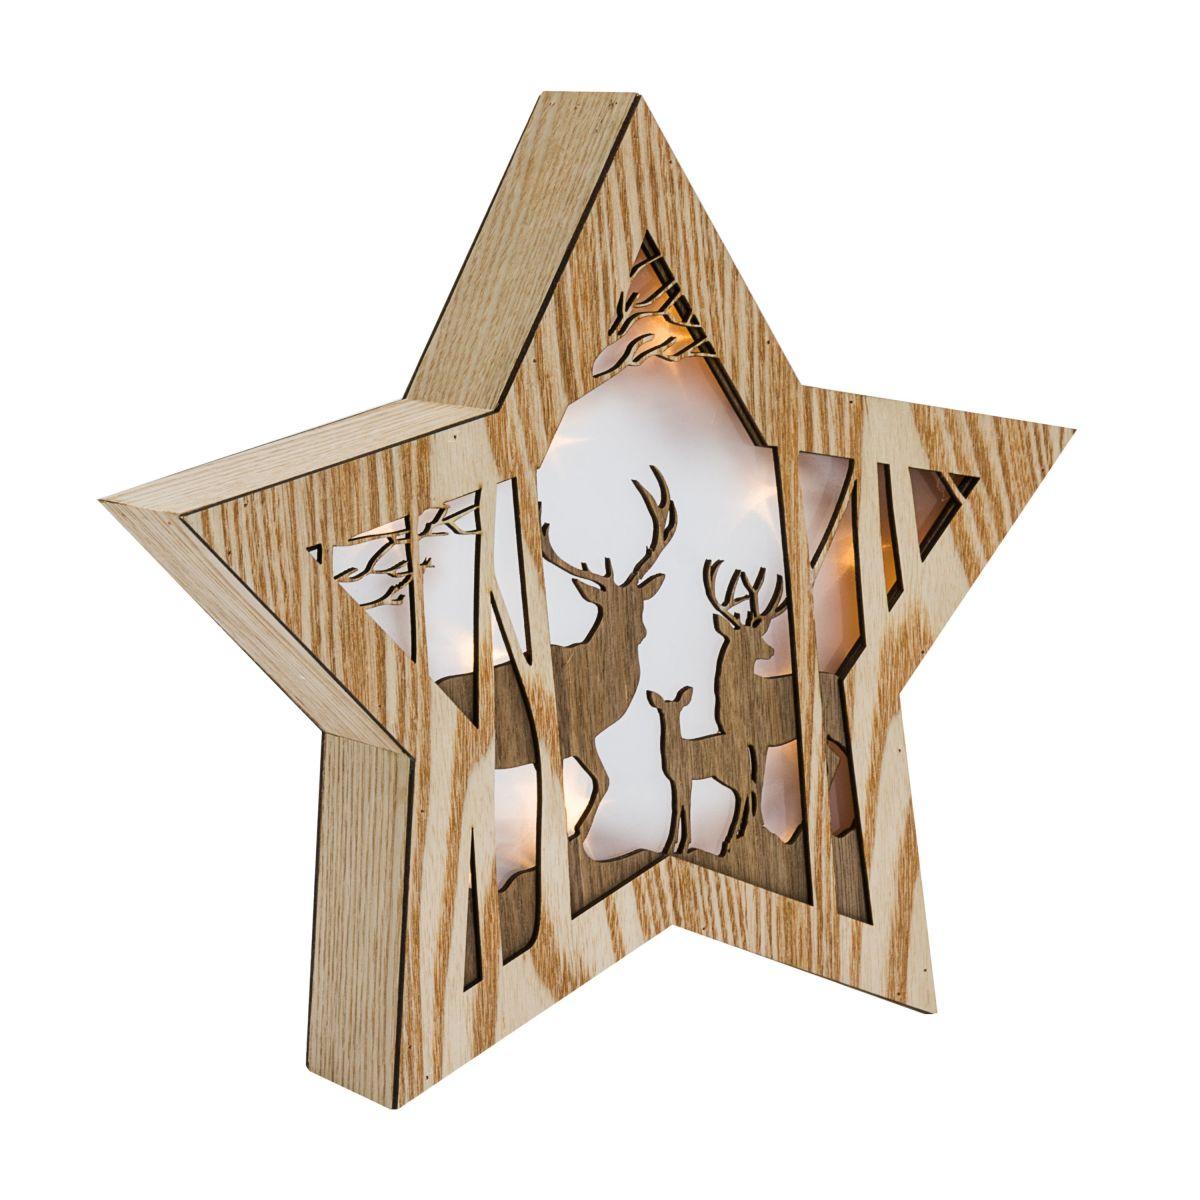 led deko objekt 3d stern wintertiere beleuchtet ca h27 cm einfach geschenke. Black Bedroom Furniture Sets. Home Design Ideas